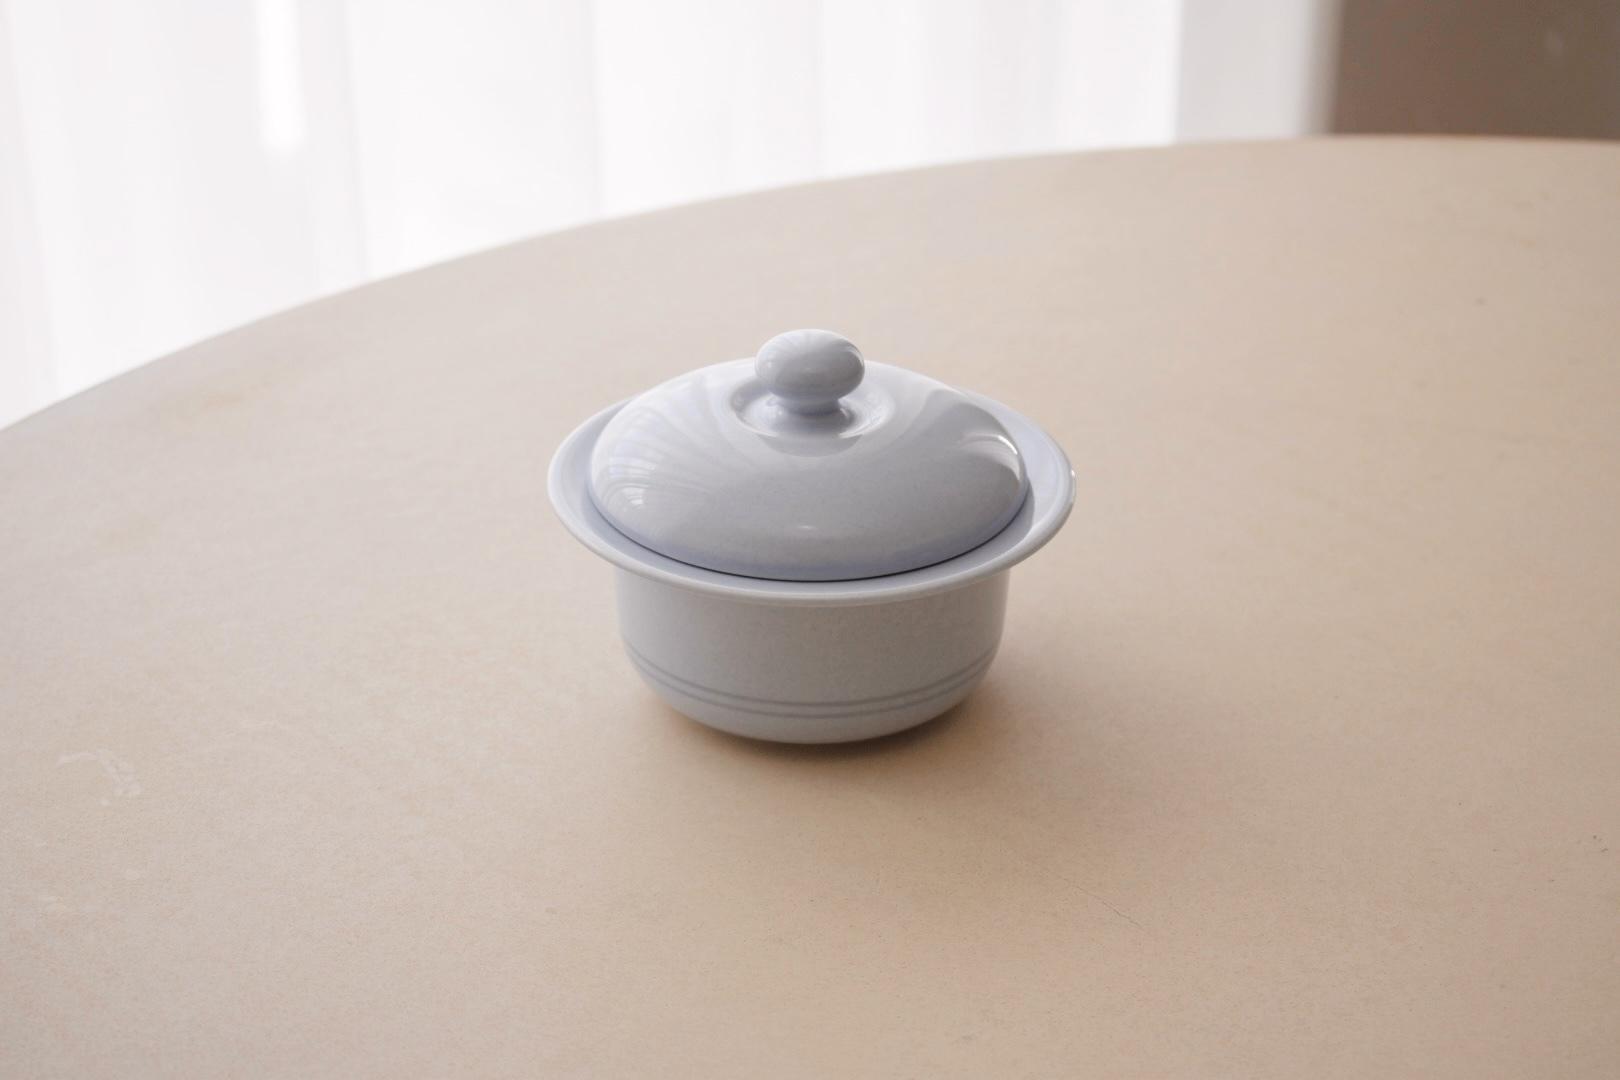 arabia arctica Sini sugar pot(Inkeri Leivo)